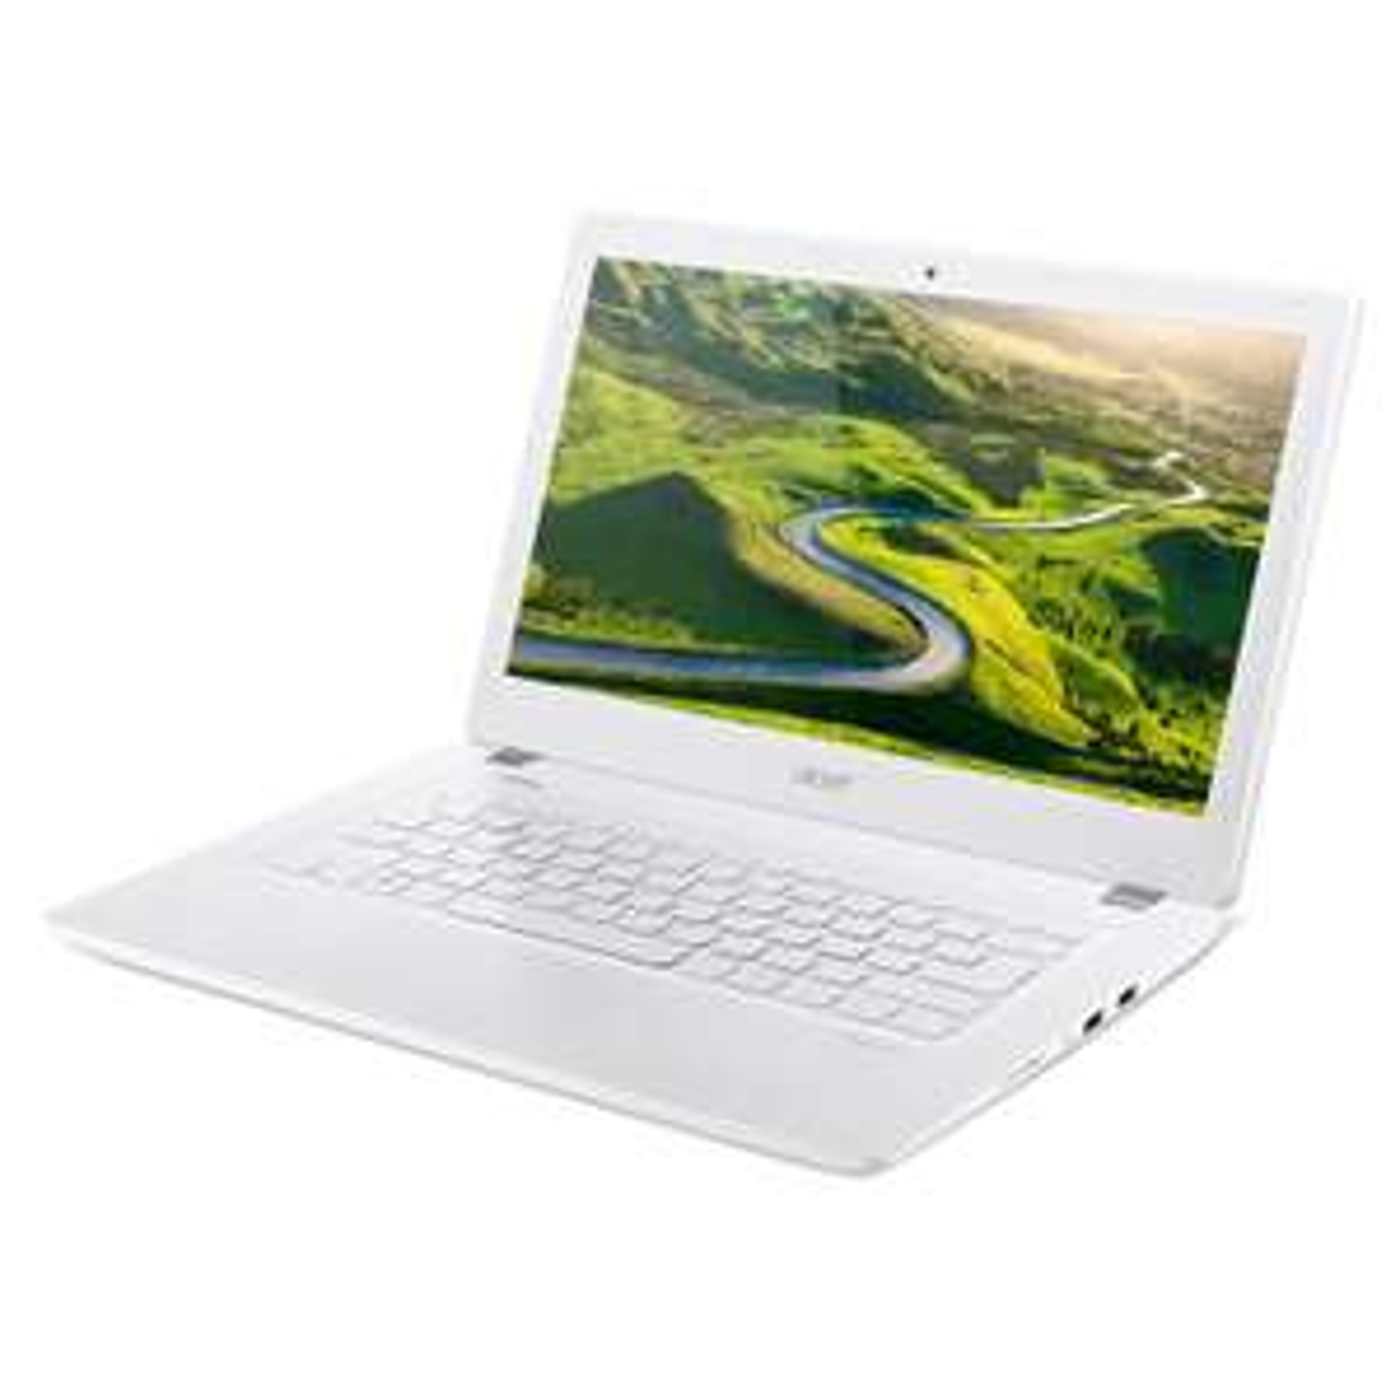 "PC Portable 13.3"" Aspire V3-372-587V (Full HD IPS, Intel Core i5-6200U, SSD 128 Go, RAM 8 Go)"